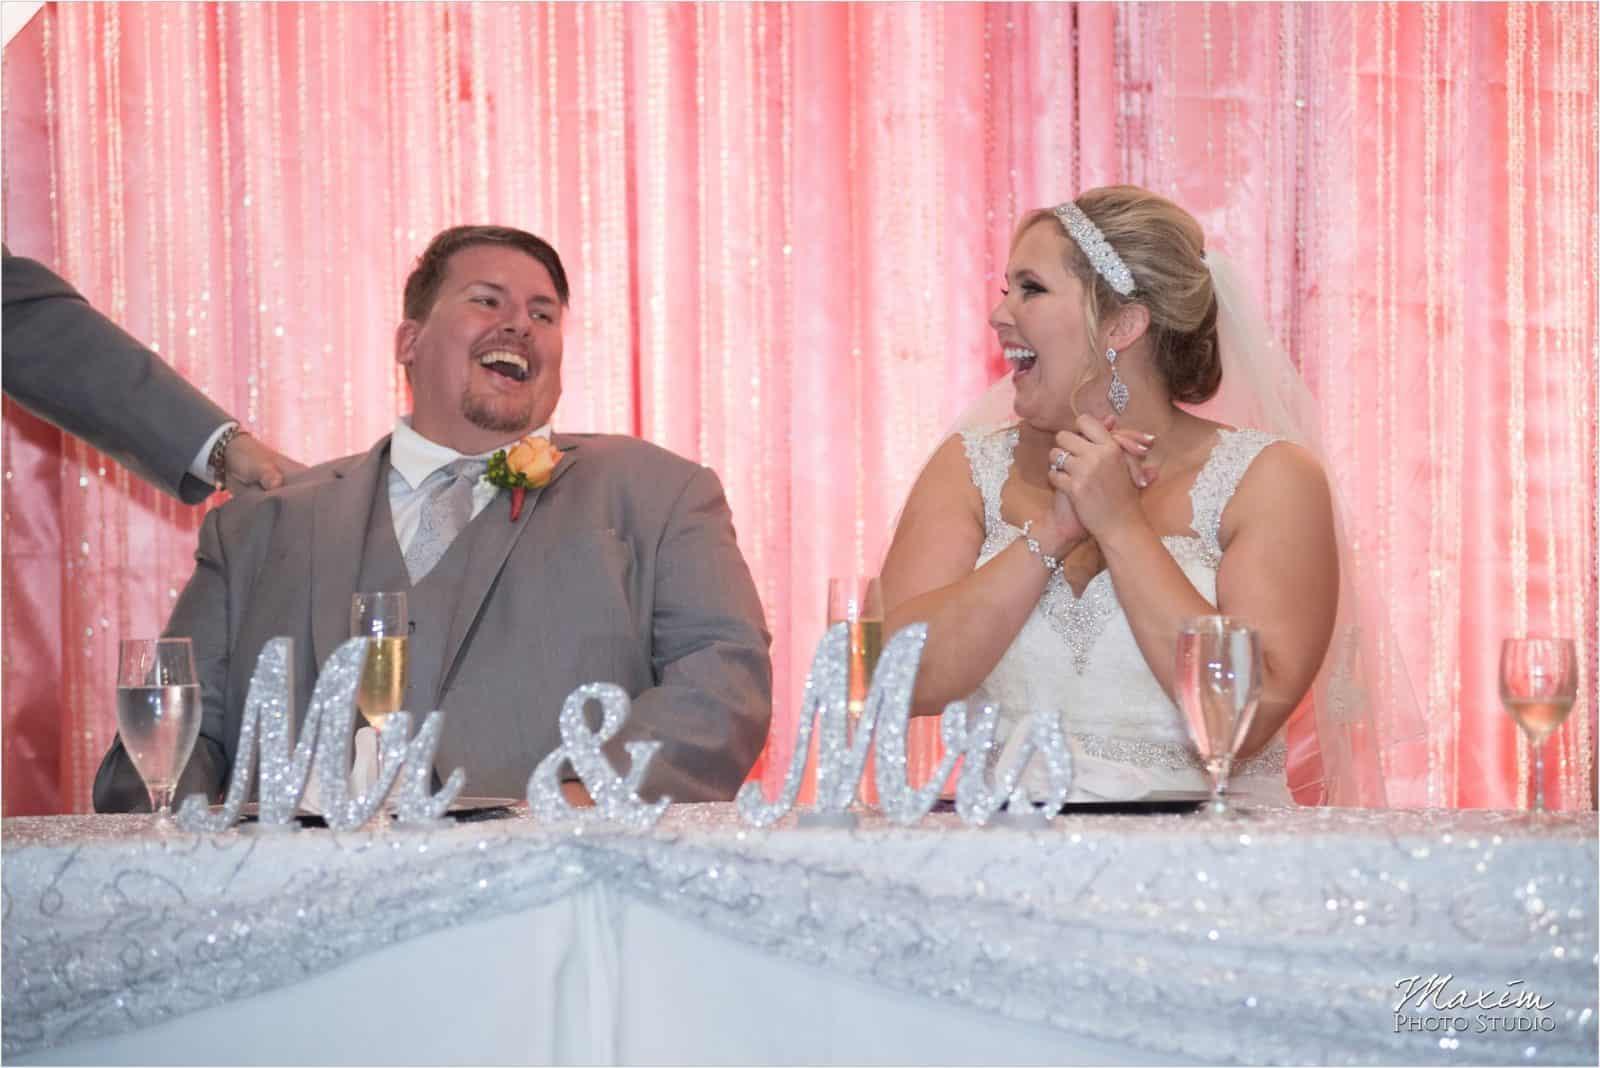 Top of the Market Dayton Ohio Wedding Reception toast